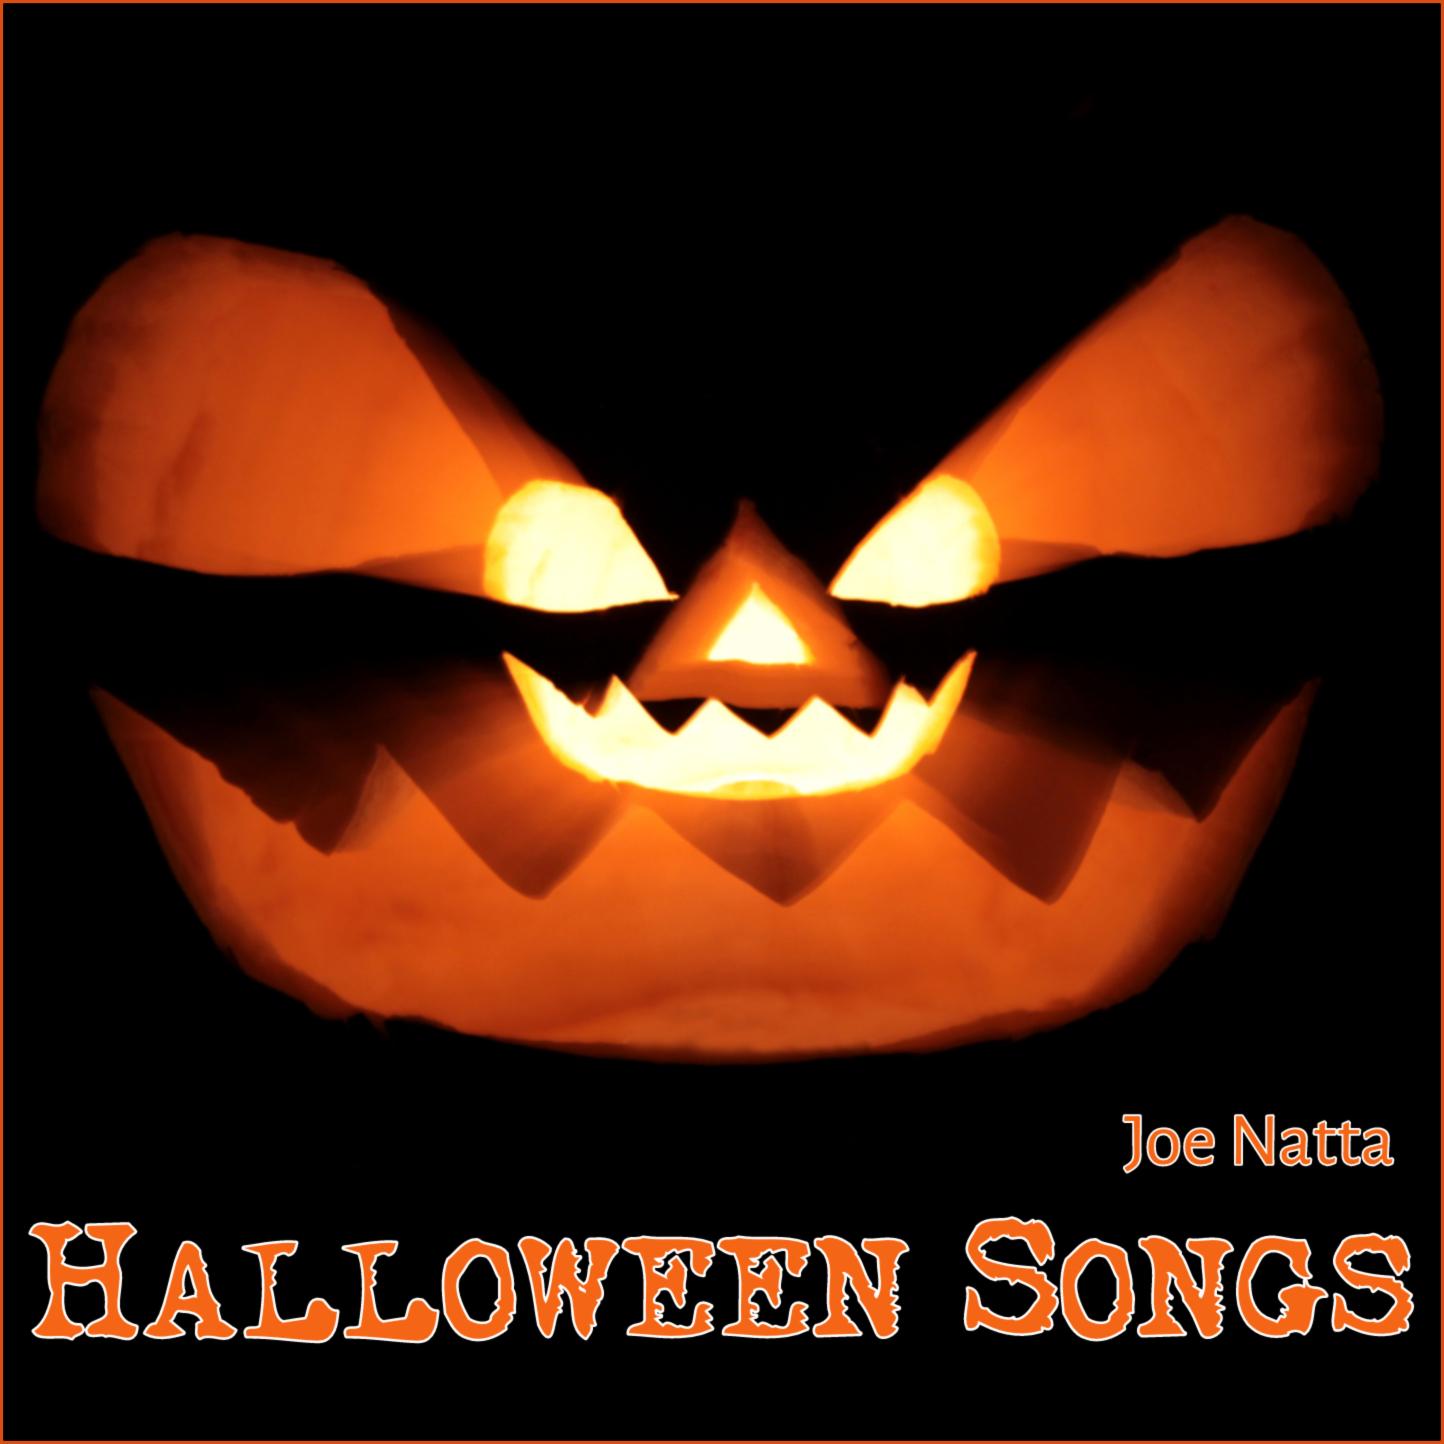 halloween songs, joe natta, musica, cantautore, canzoni, festa di halloween, festa streghe, halloween celebration, this is halloween, horror music, halloween 2019, halloween music, all hallows eve